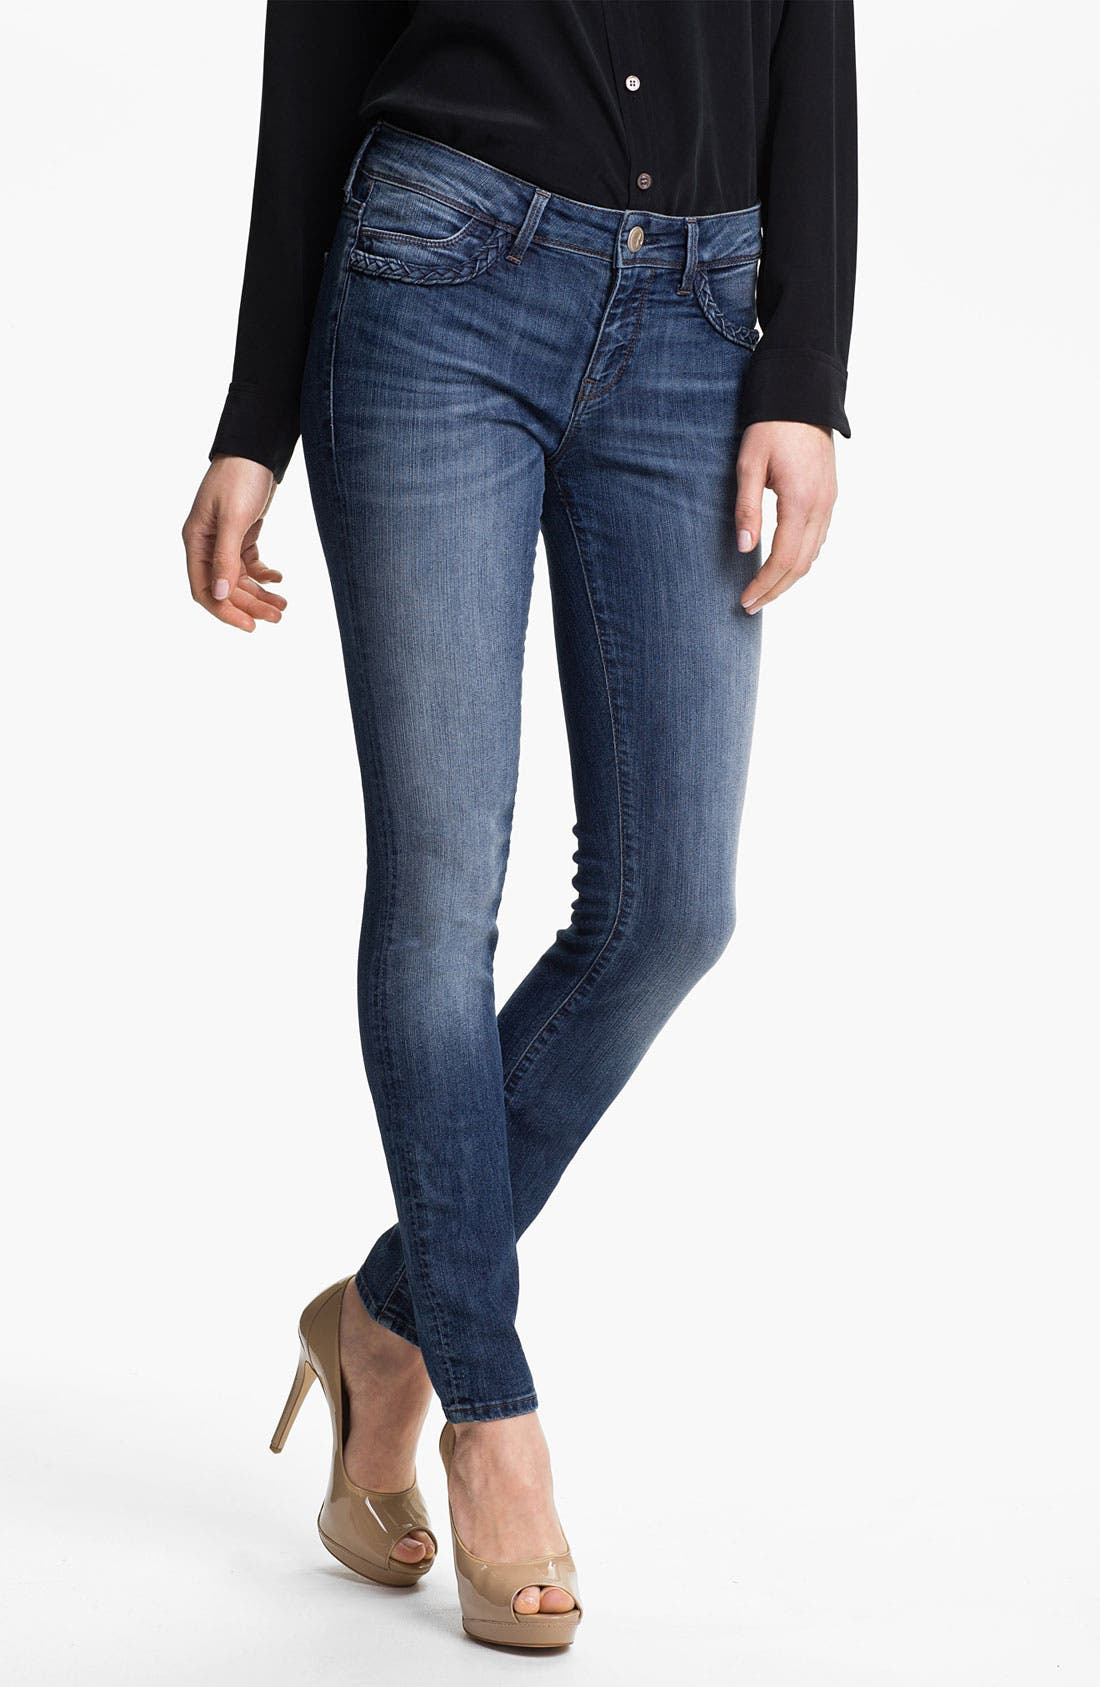 Alternate Image 1 Selected - Mavi Jeans 'Alexa' Braid Trim Jeans (Dark)